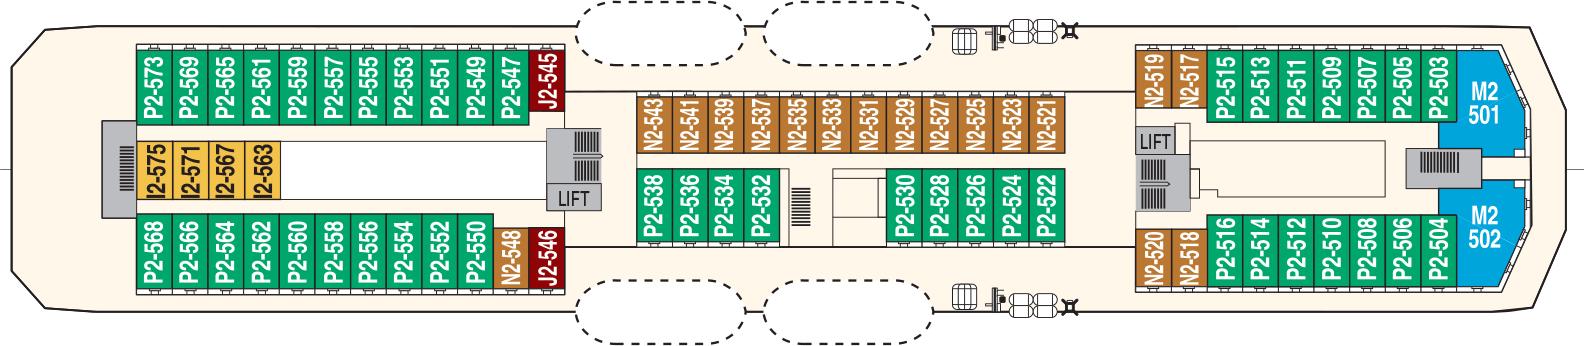 Hurtigruten MS Richard With Deck Plans Deck 5.png